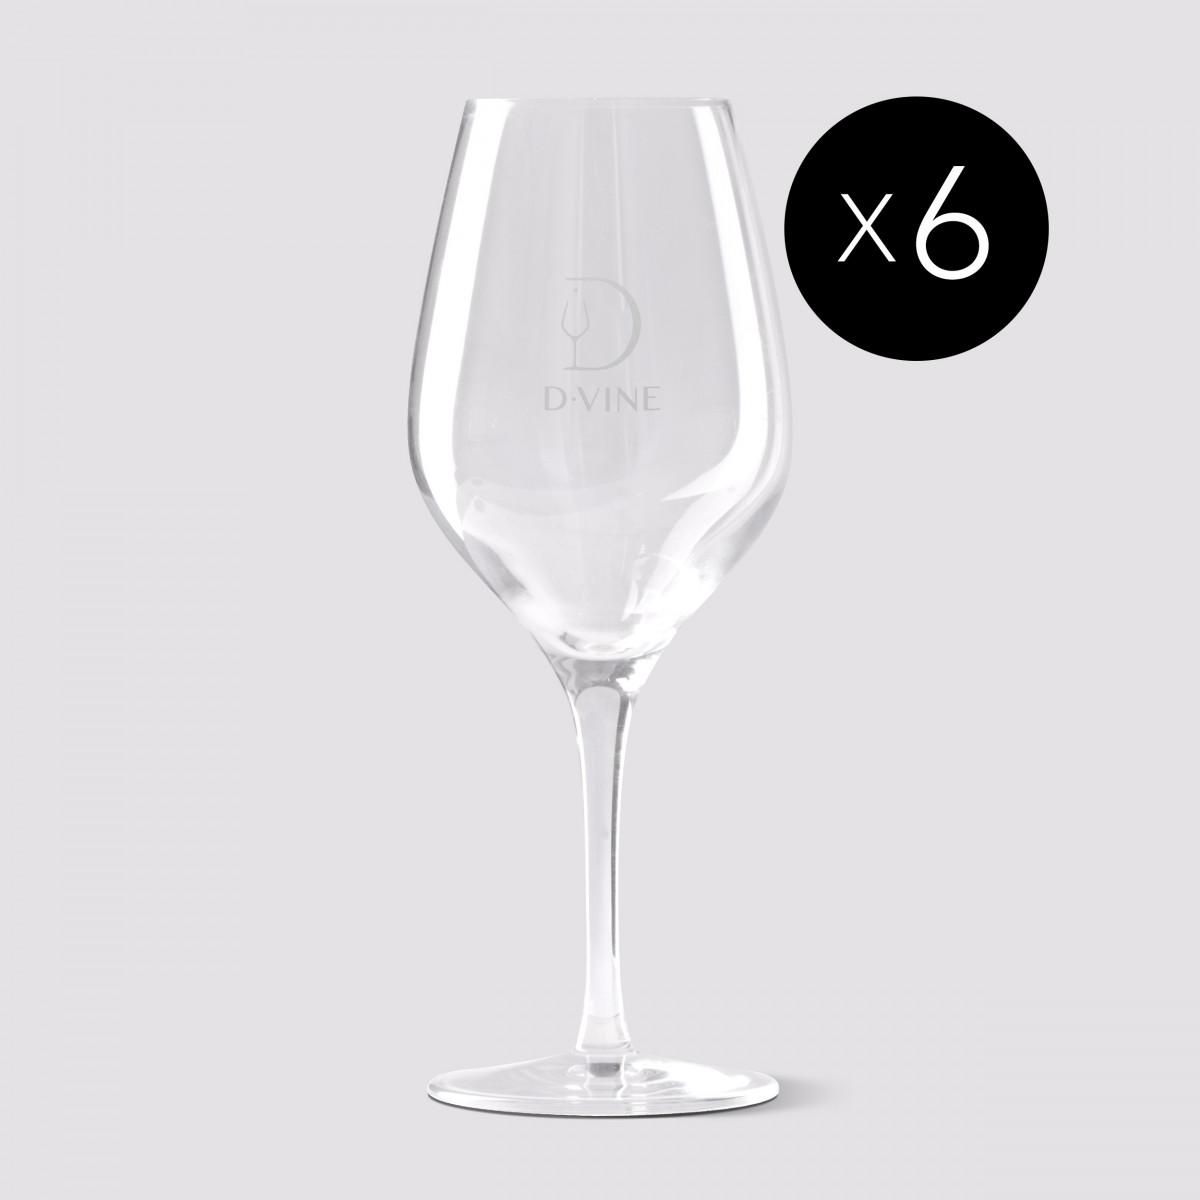 6 D-Vine glasses